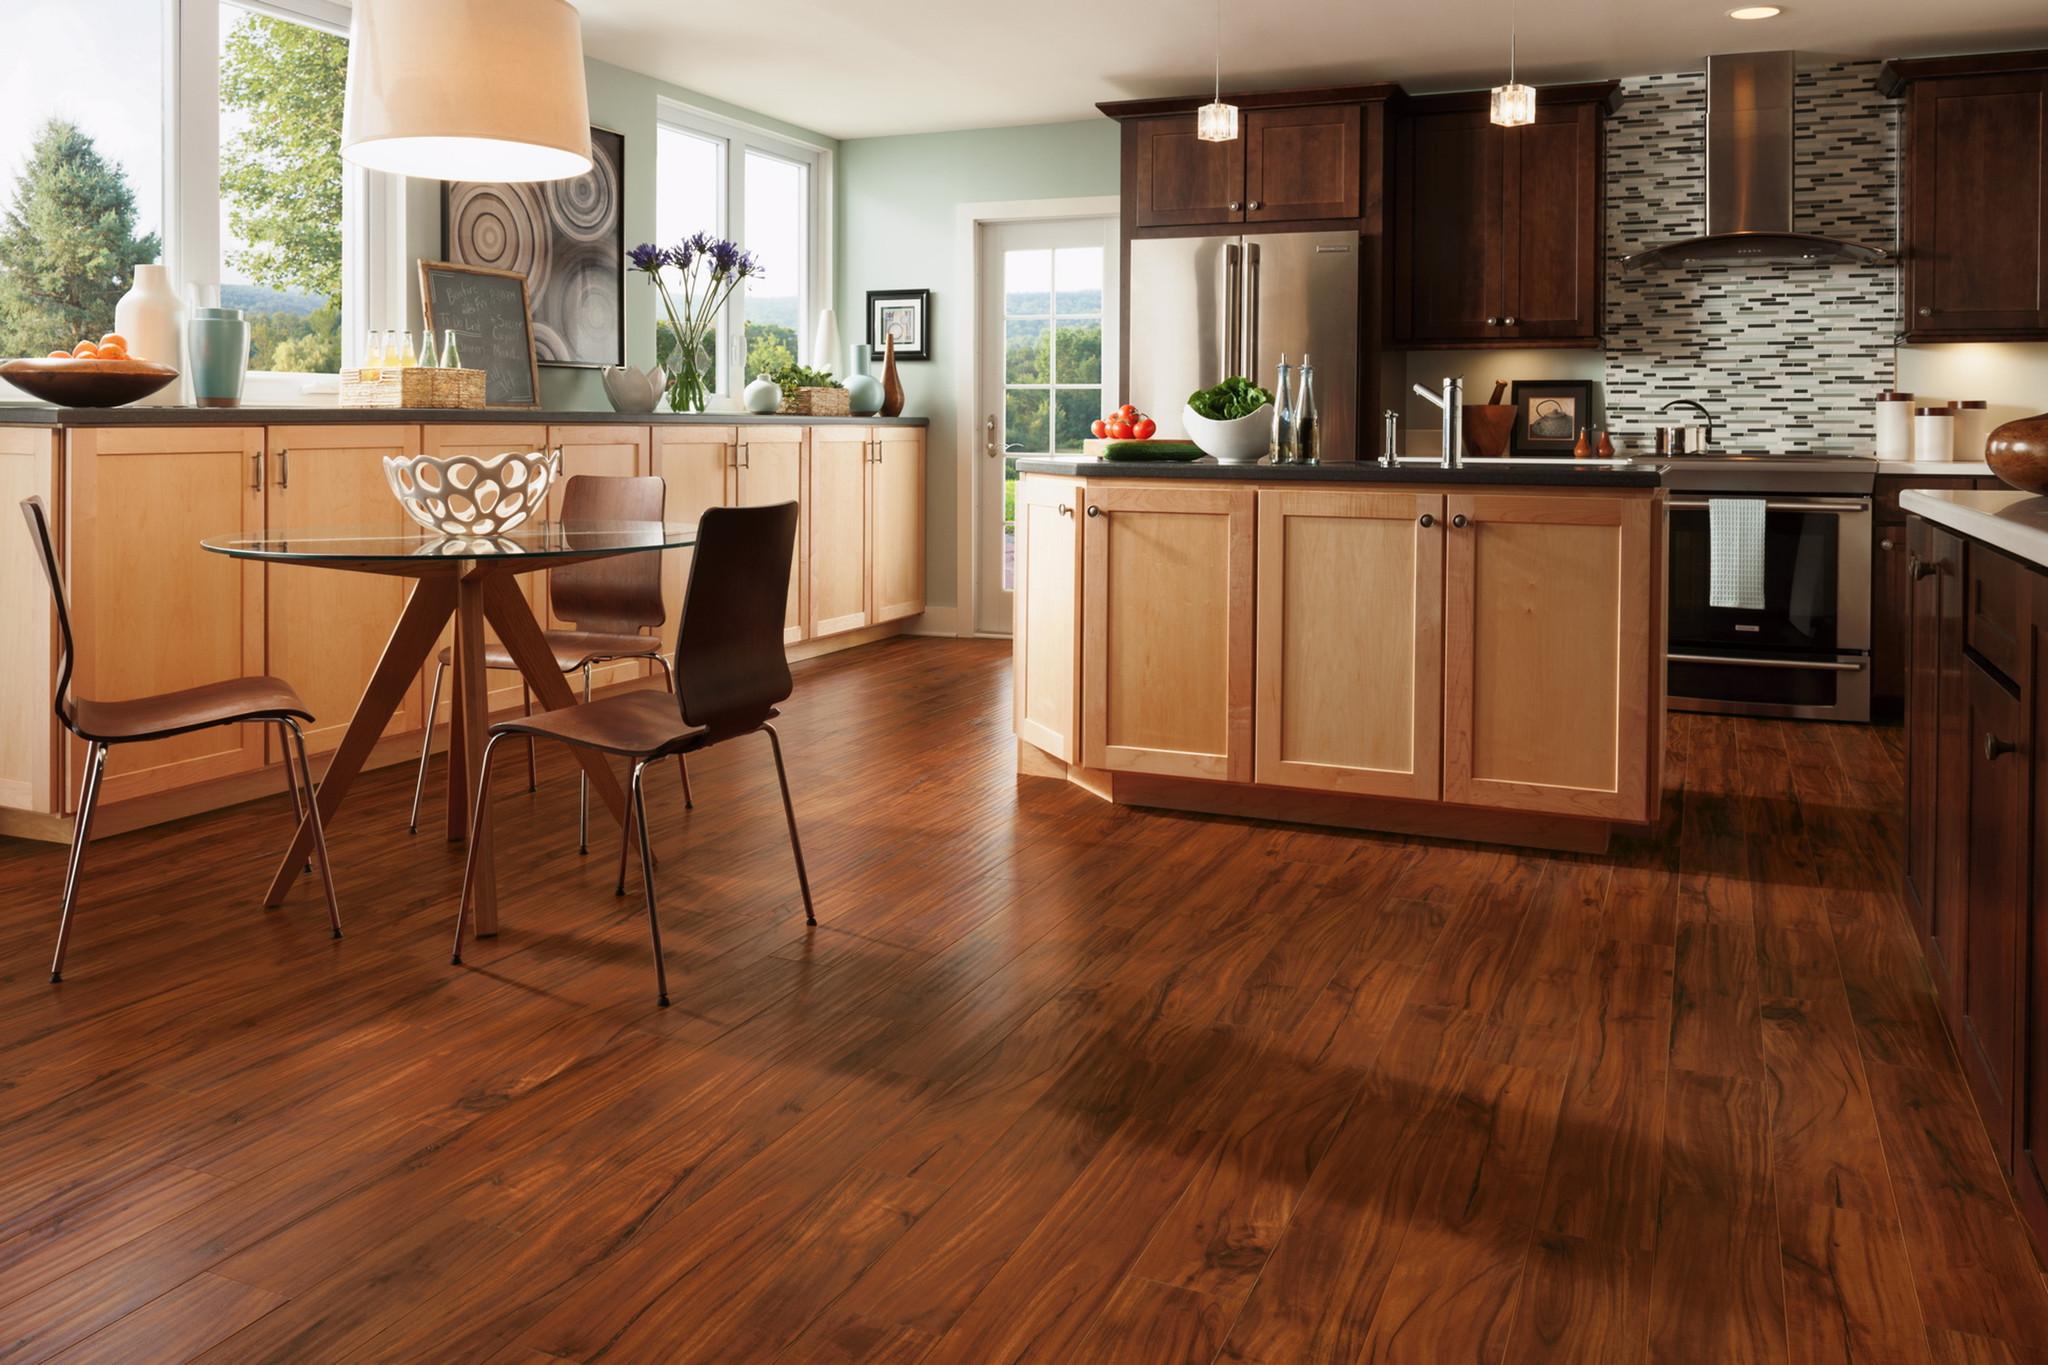 Kitchen Improvements Photos Top 5 Most Desired Home Improvements Chicago Tribune